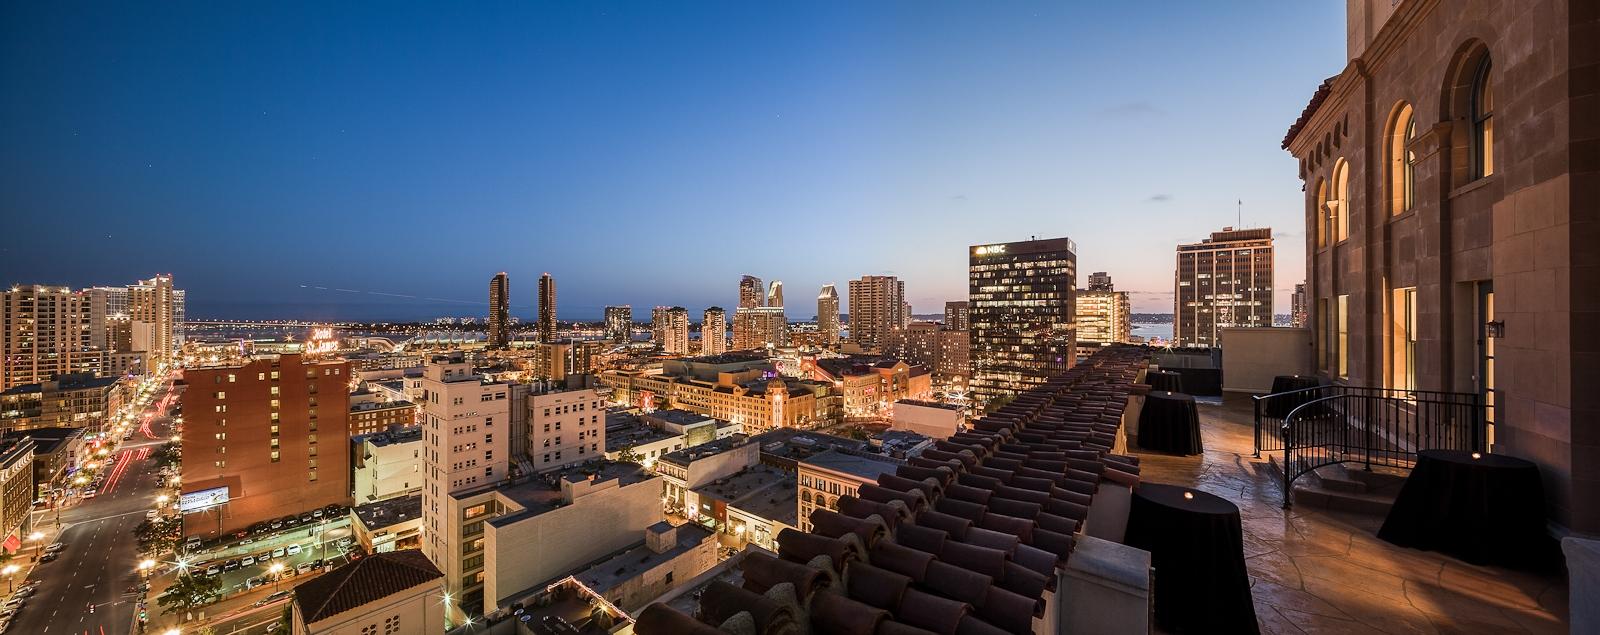 Courtyard by Marriott - San Diego Downtown